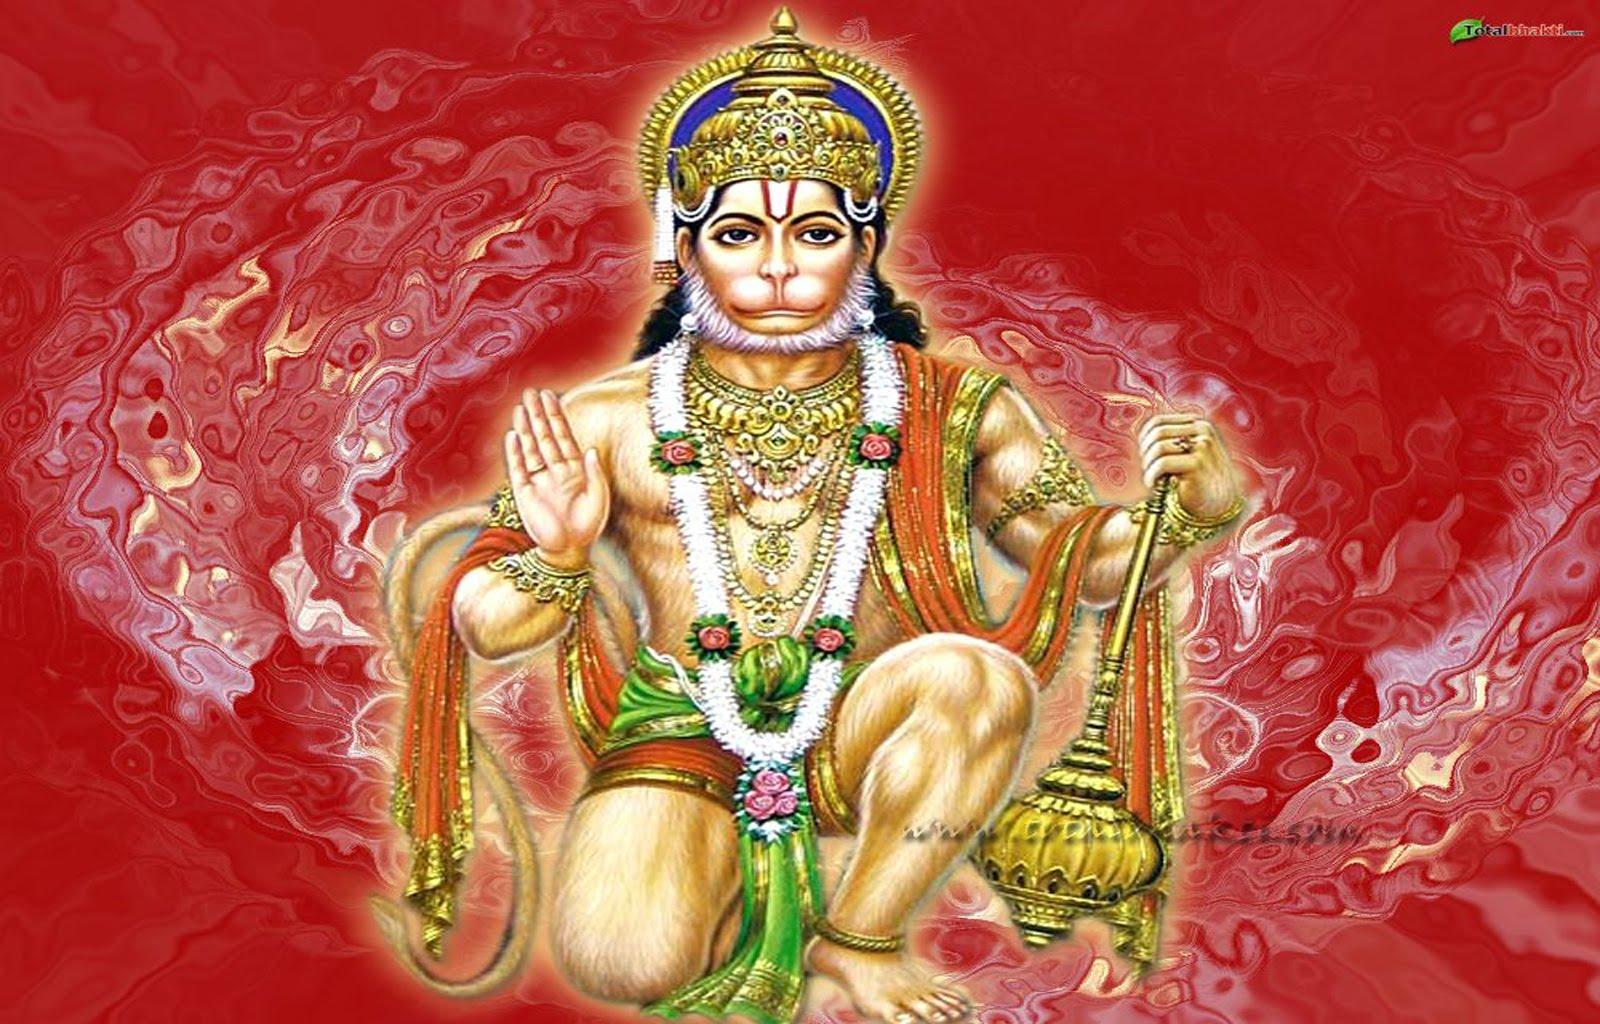 Jalwa Hanuman Picture More God Maa Saraswati Send Happy Janmashtami